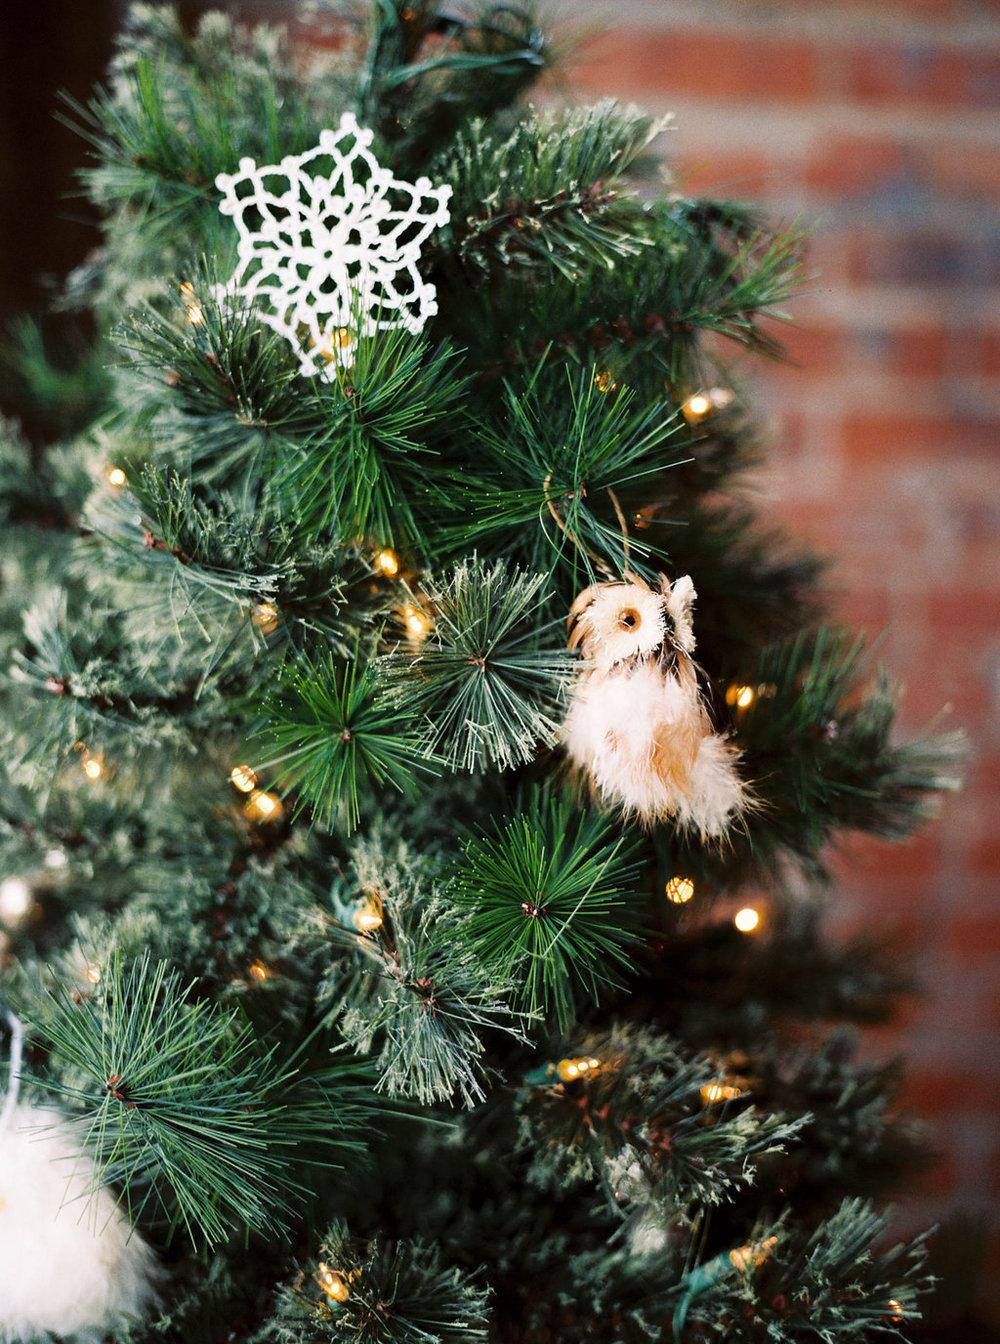 Newlywed_Christmas_14.JPG